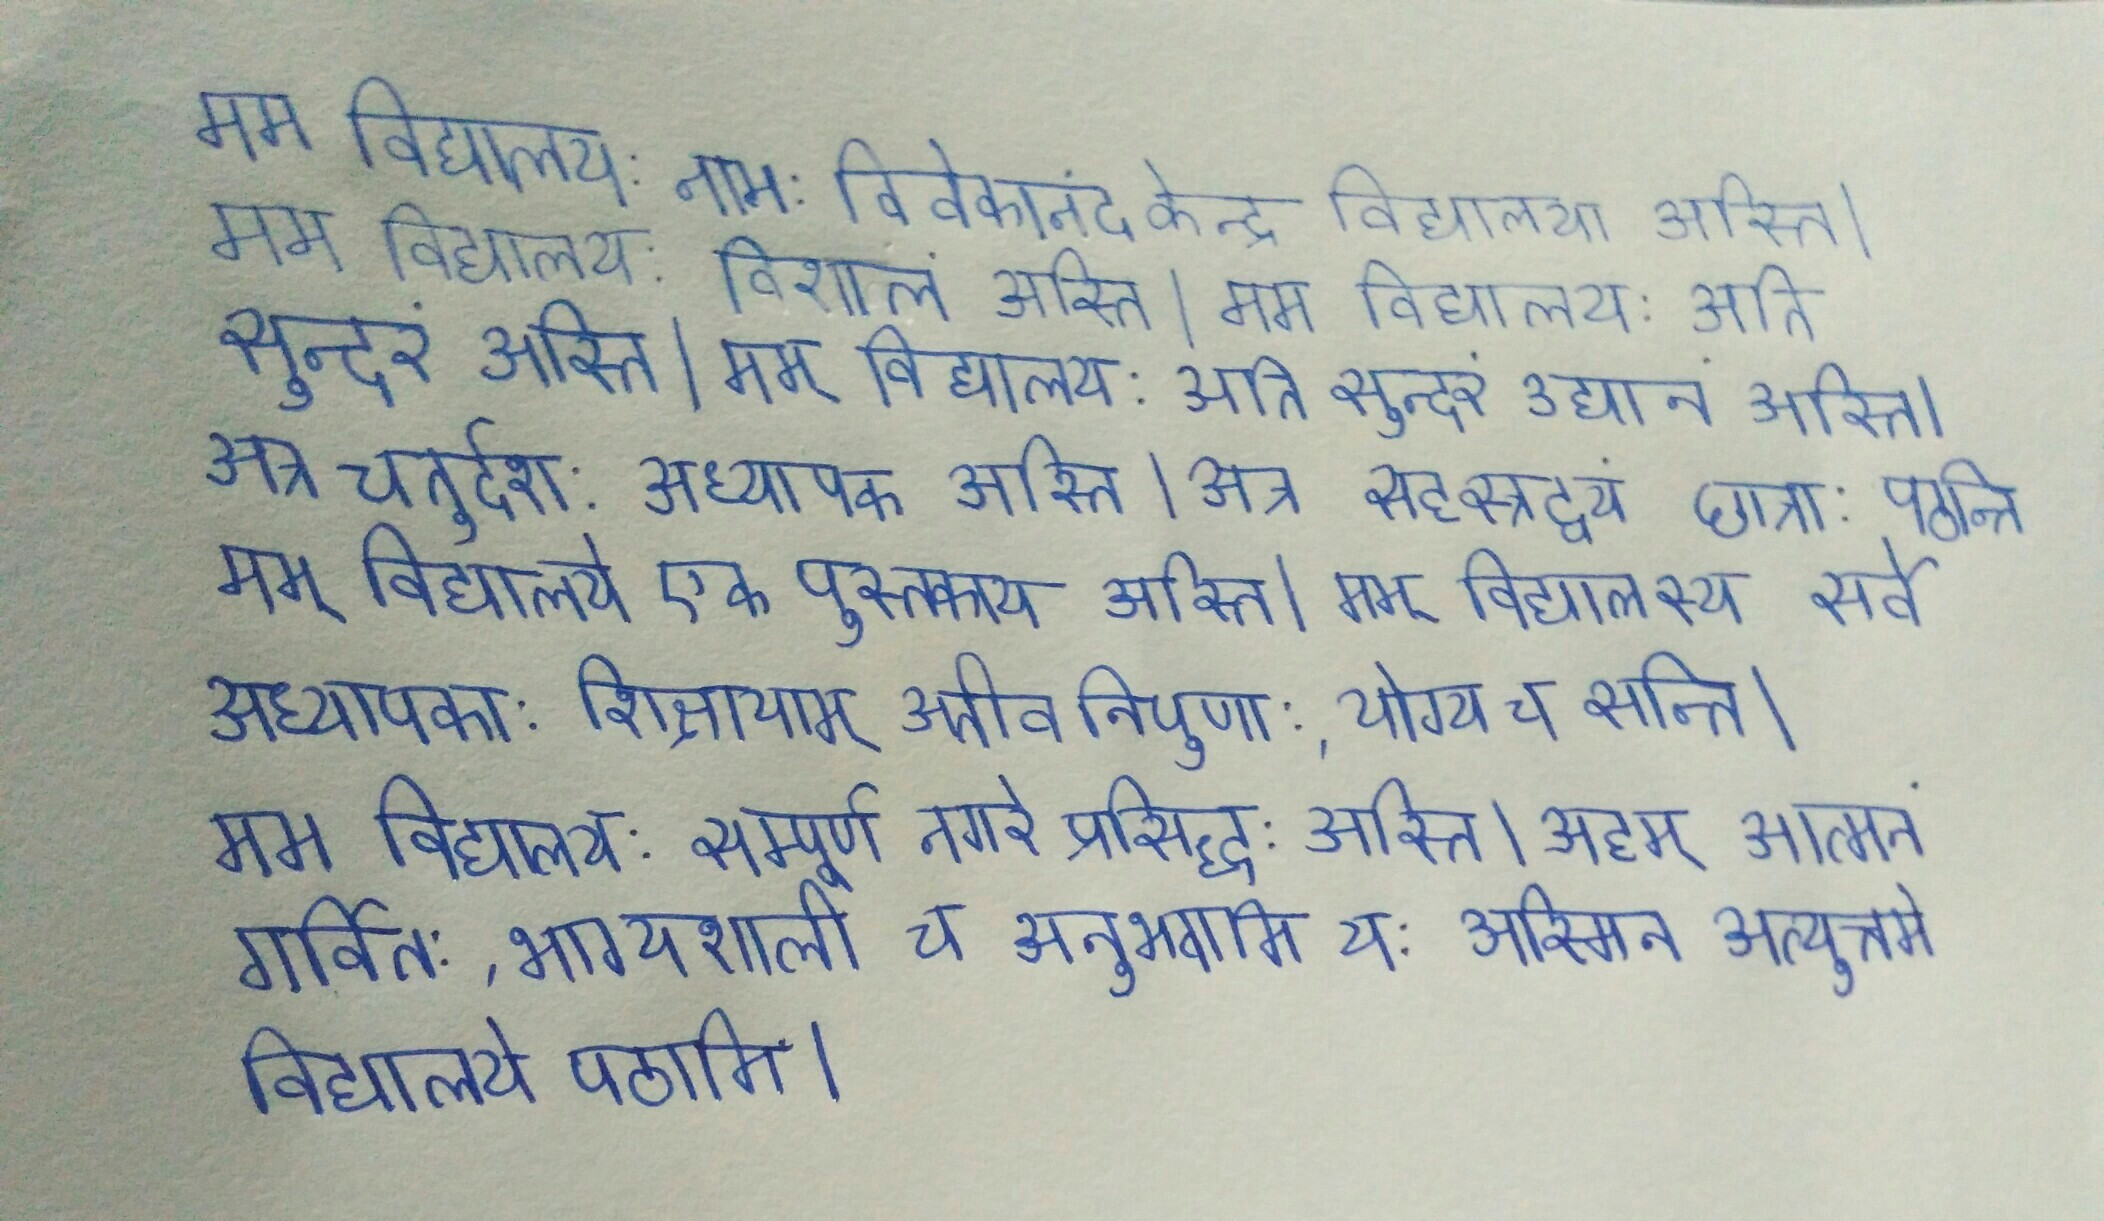 School Par Essay In Sanskrit - Write essay on my school in